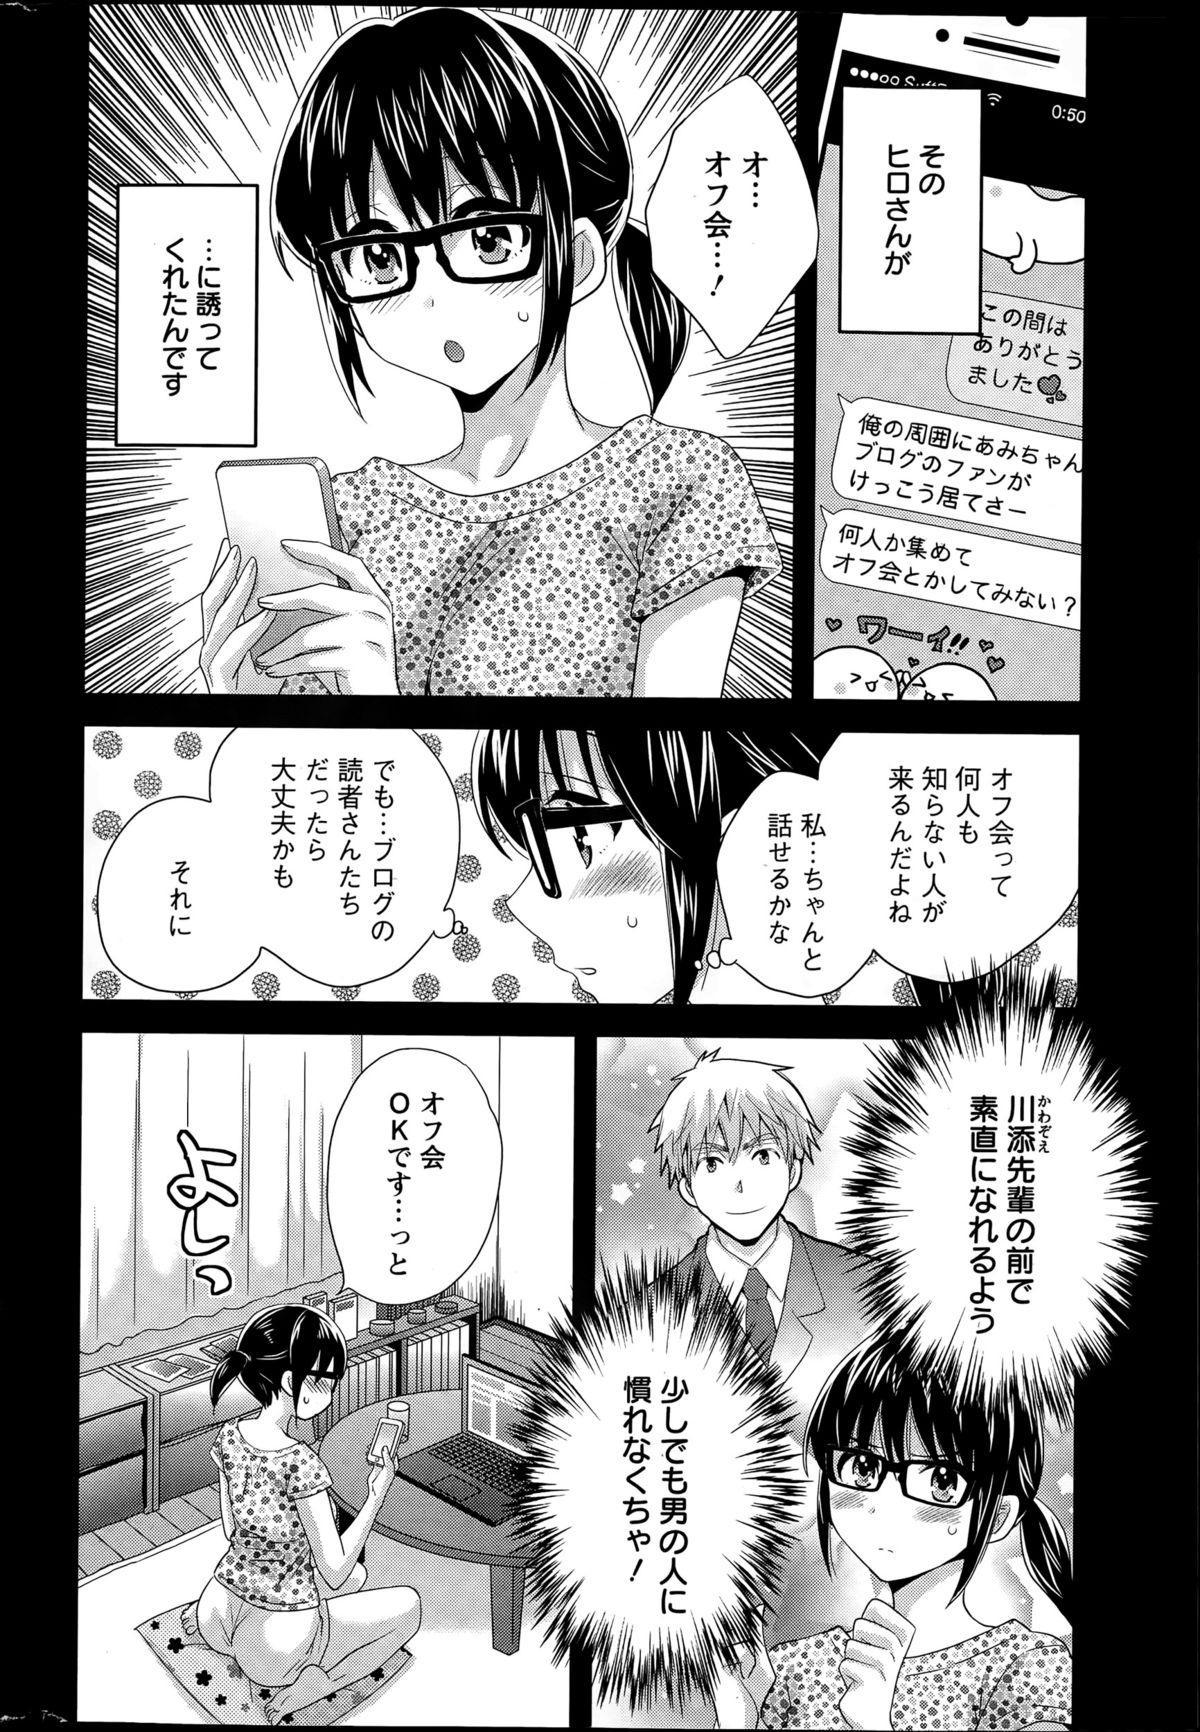 [Pon Takahanada] Otani-san no Cosplay Jijou Ch. 1-5 21